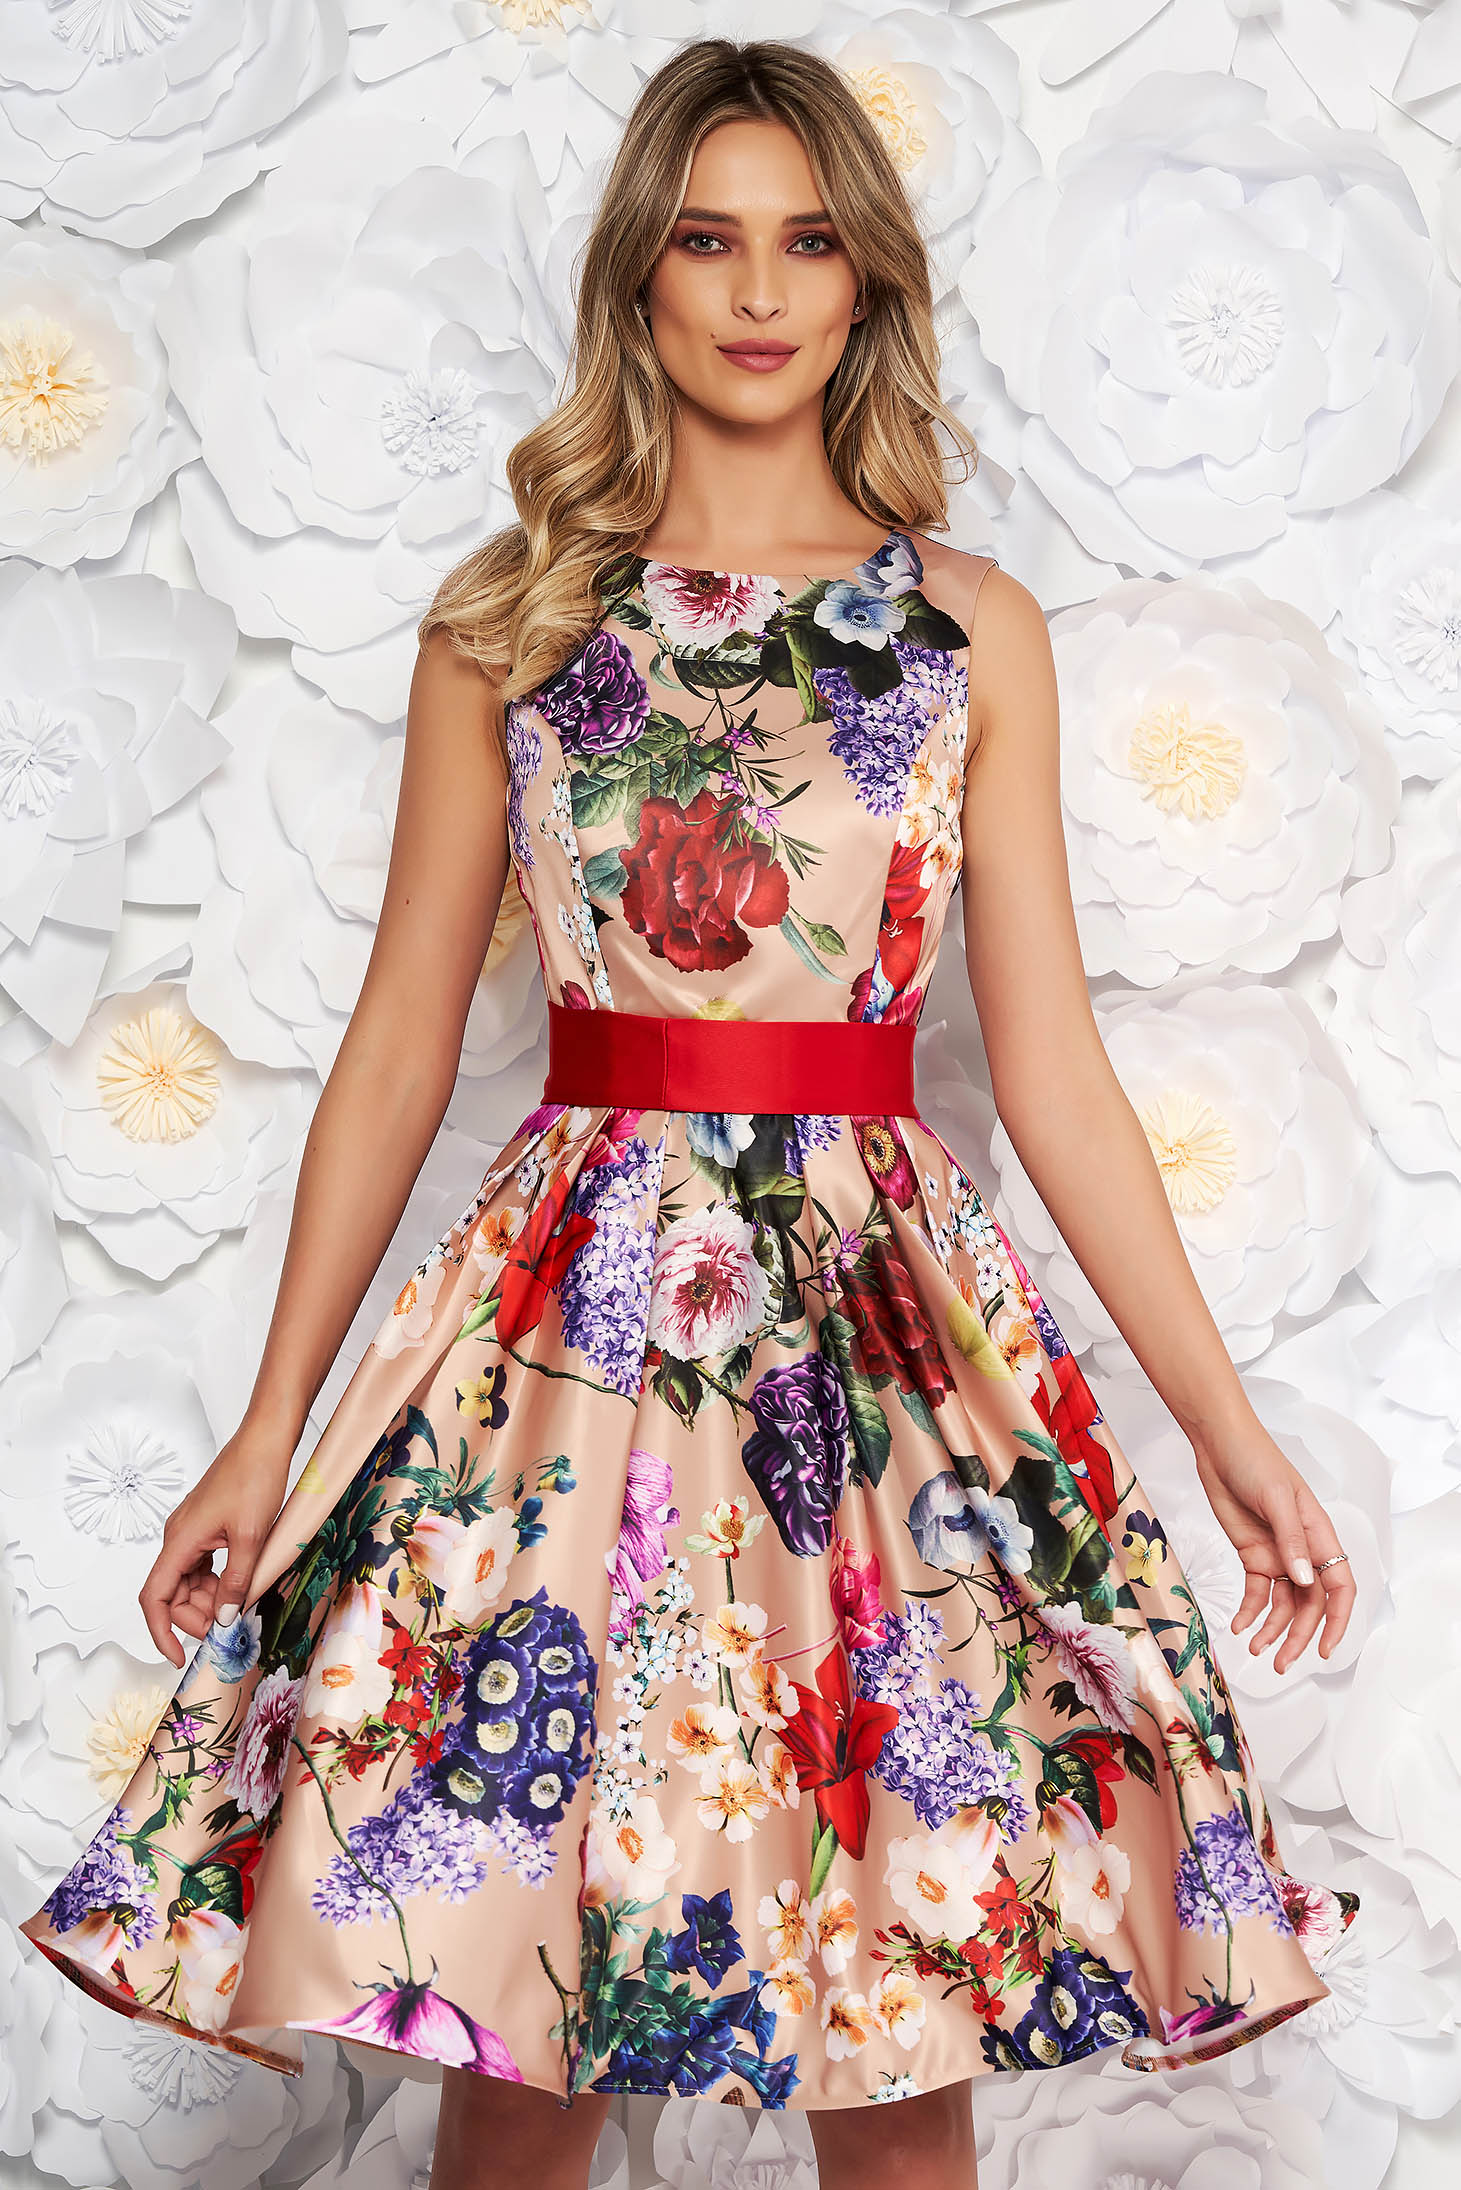 Rochie Artista crem midi de ocazie din satin croi in clos fara maneci accesorizata cu cordon si imprimeu floral